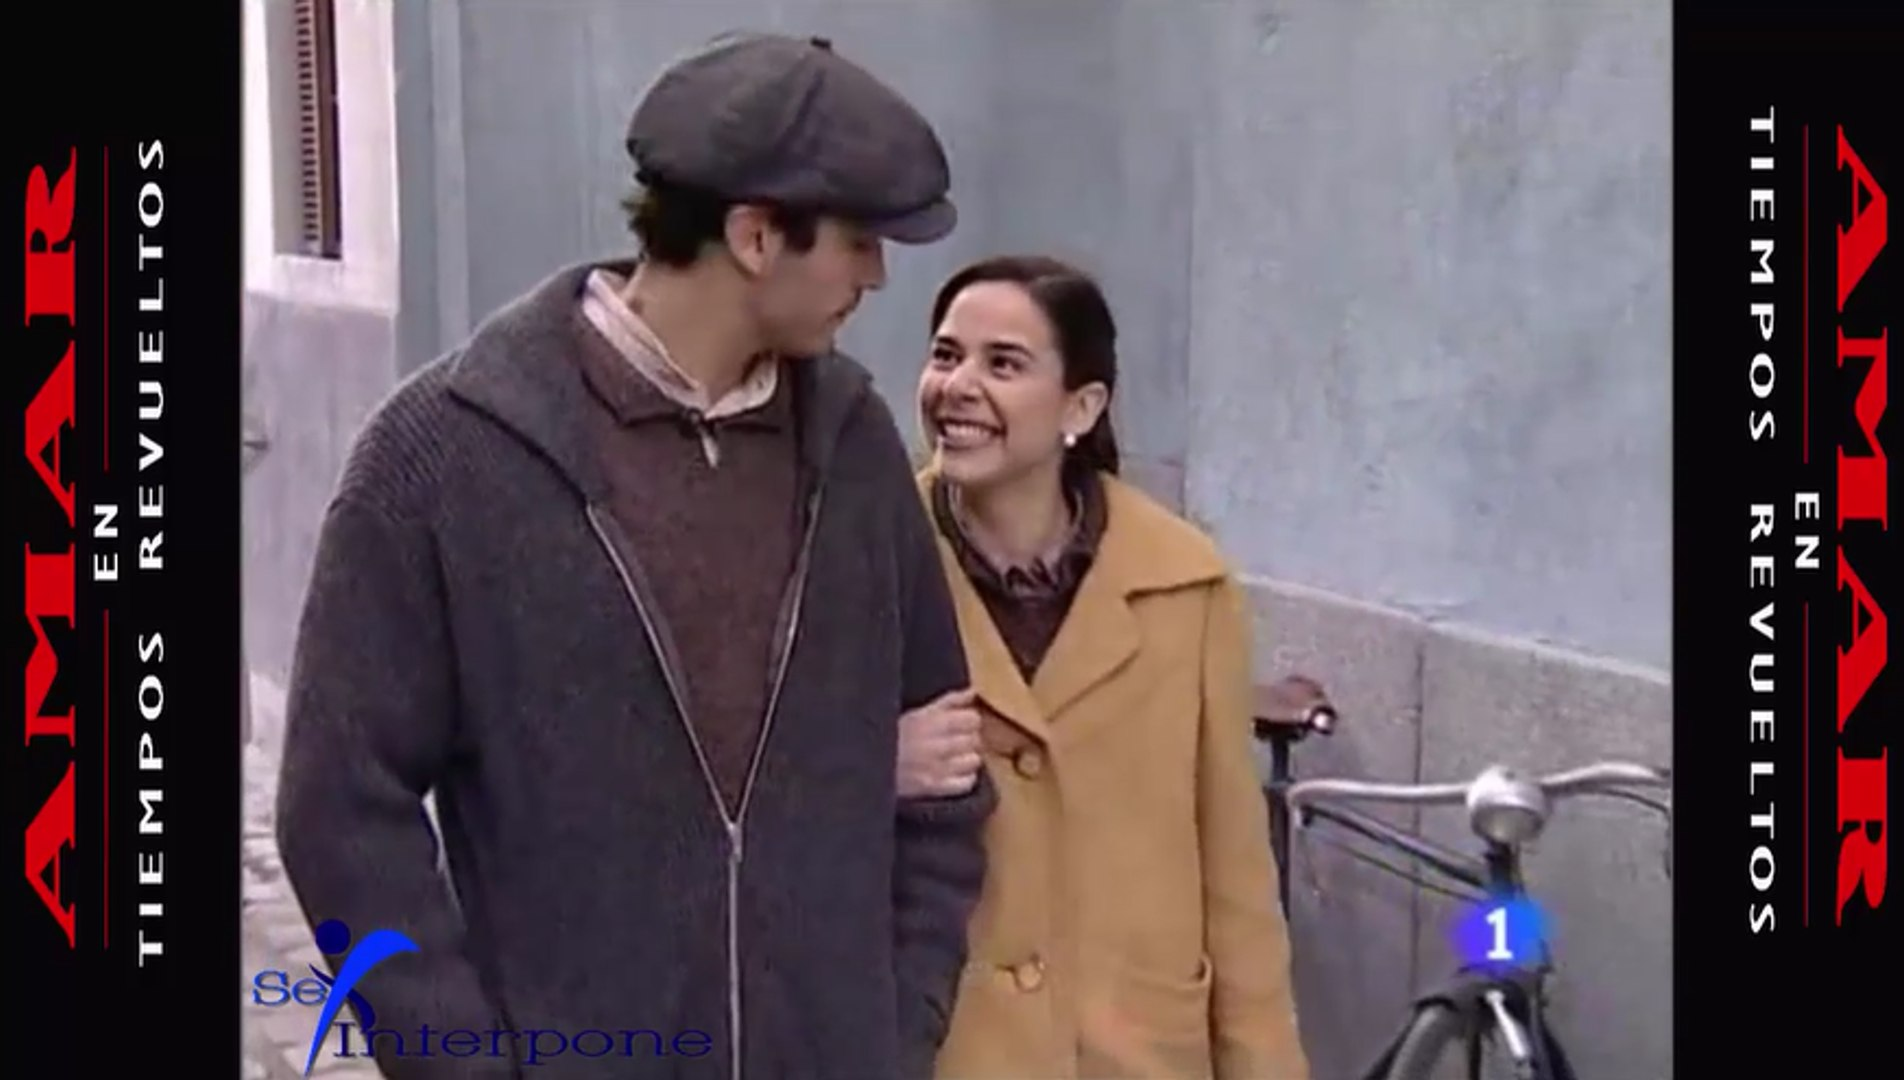 Ana y Teresa. AETR. Temporada 4. cap 159 HD